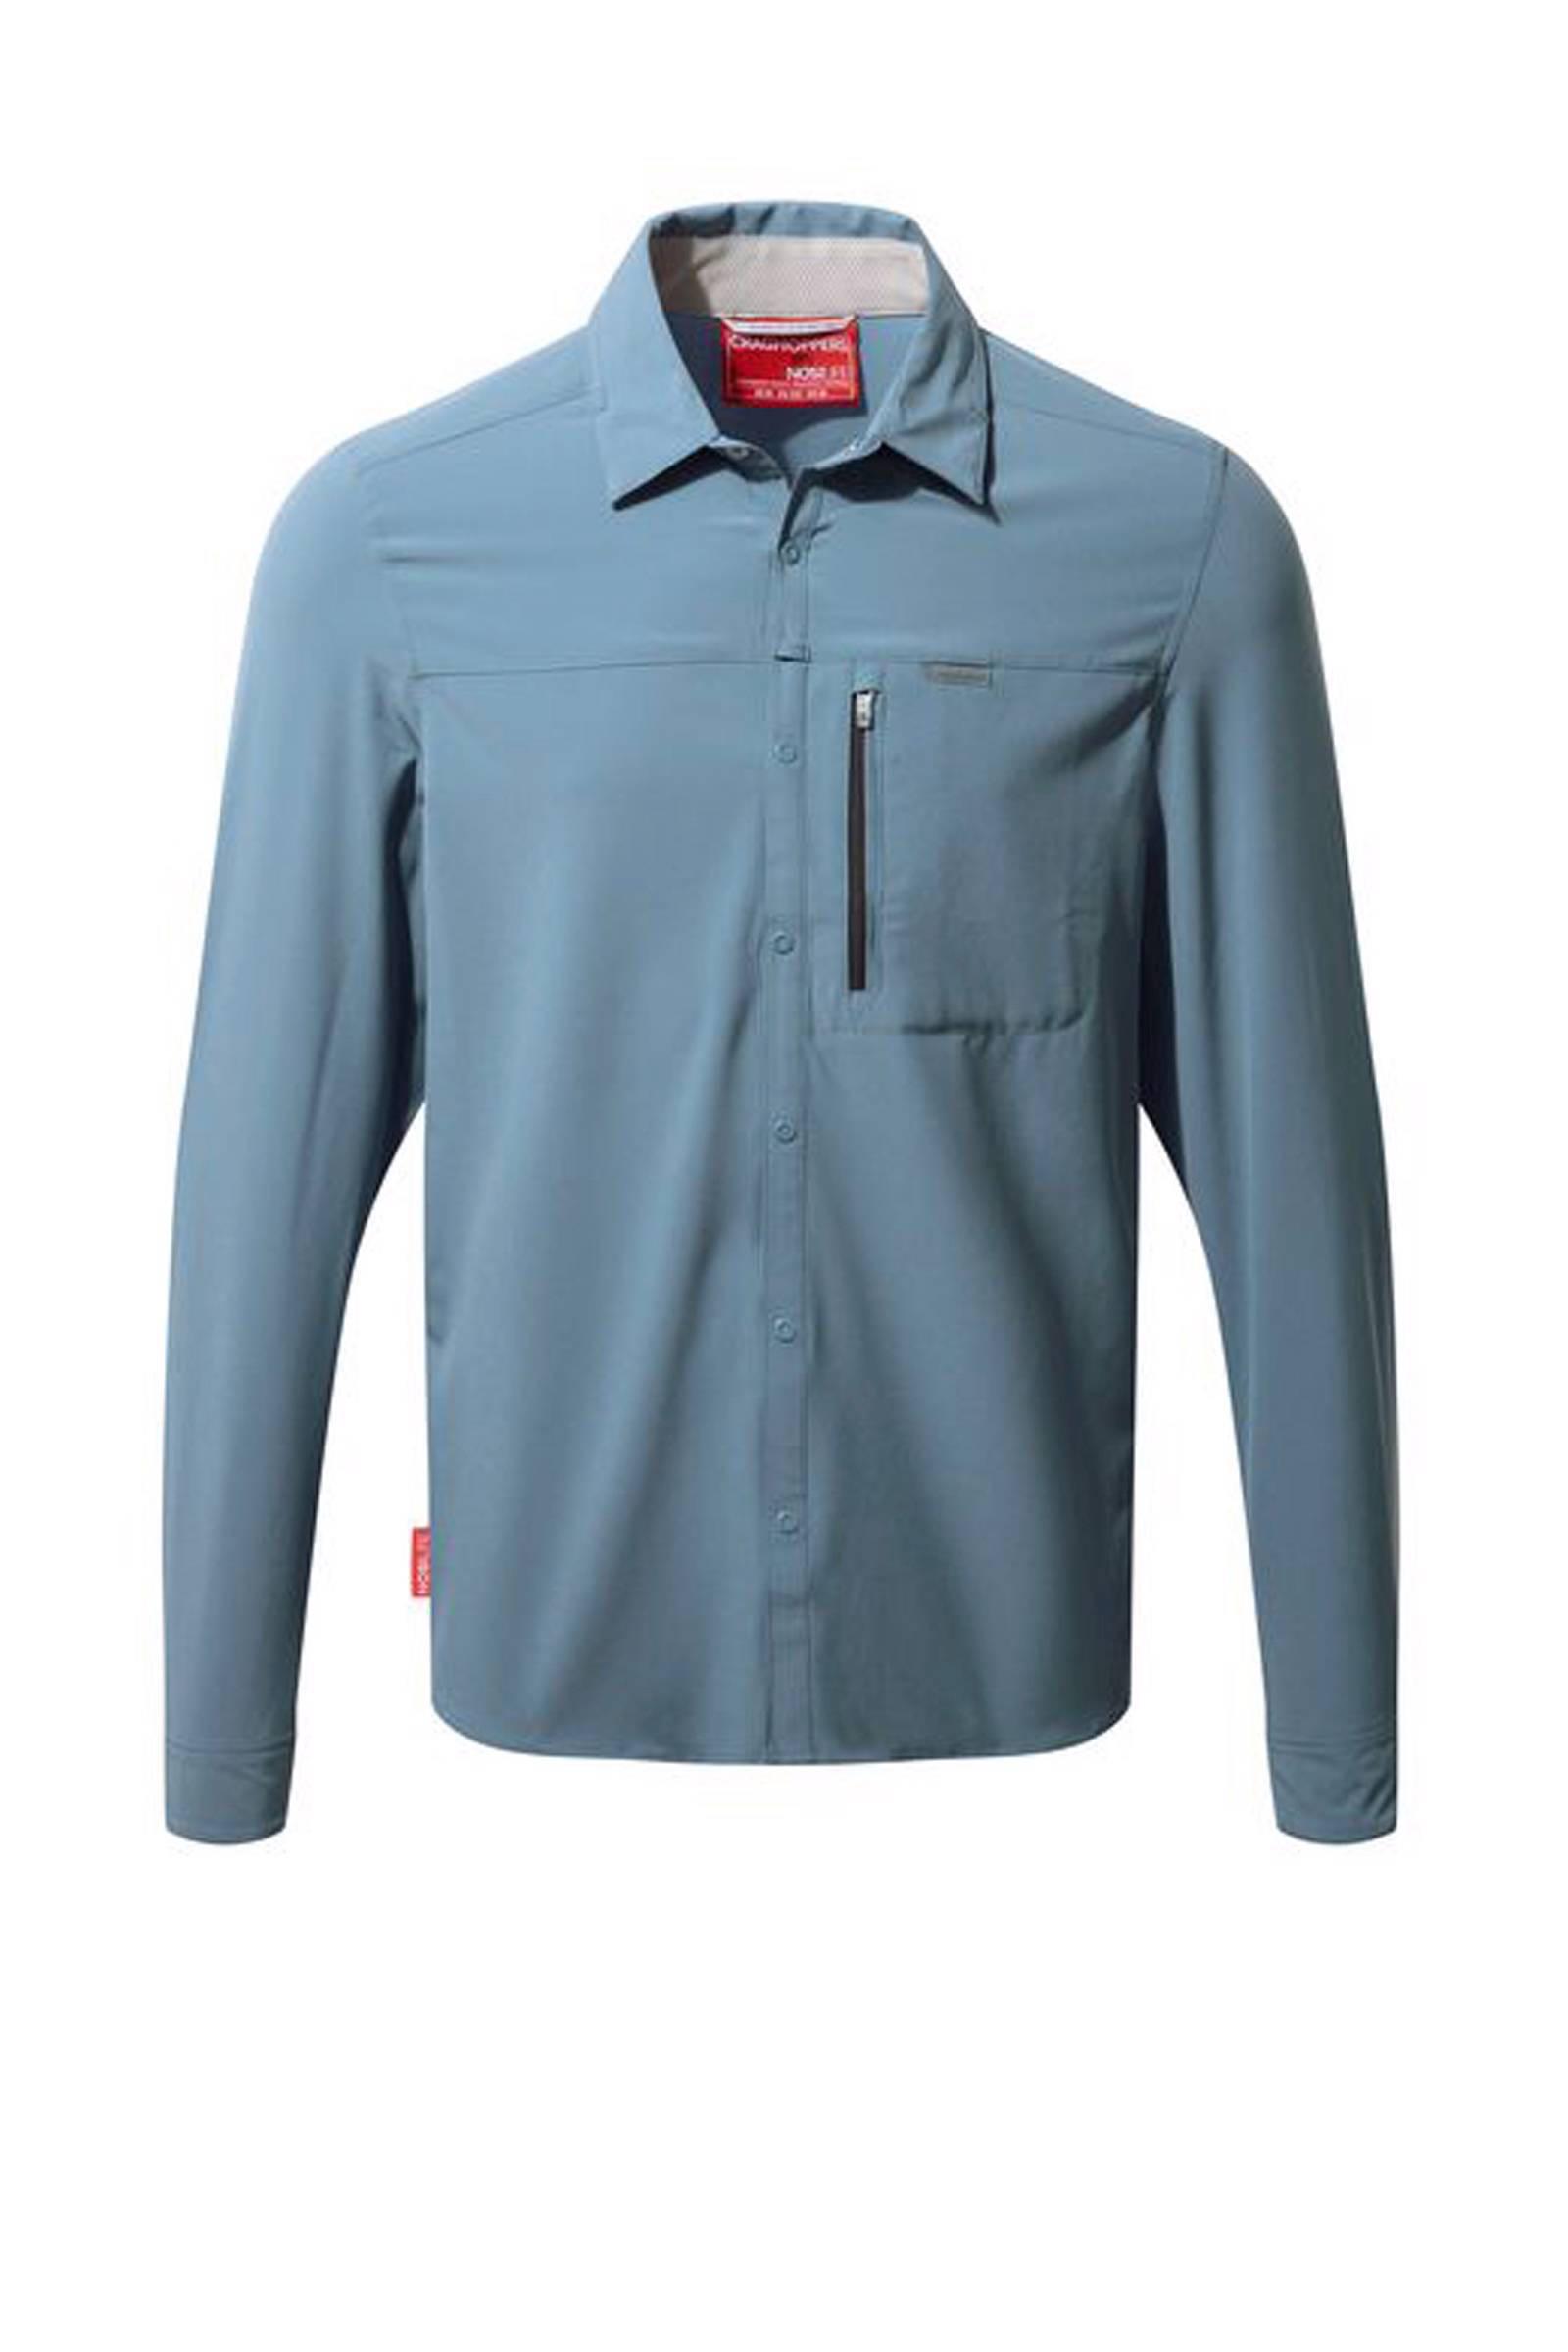 overhemd Craghoppers lichtgewicht outdoor Nosilife Pro wTrPTqSIB